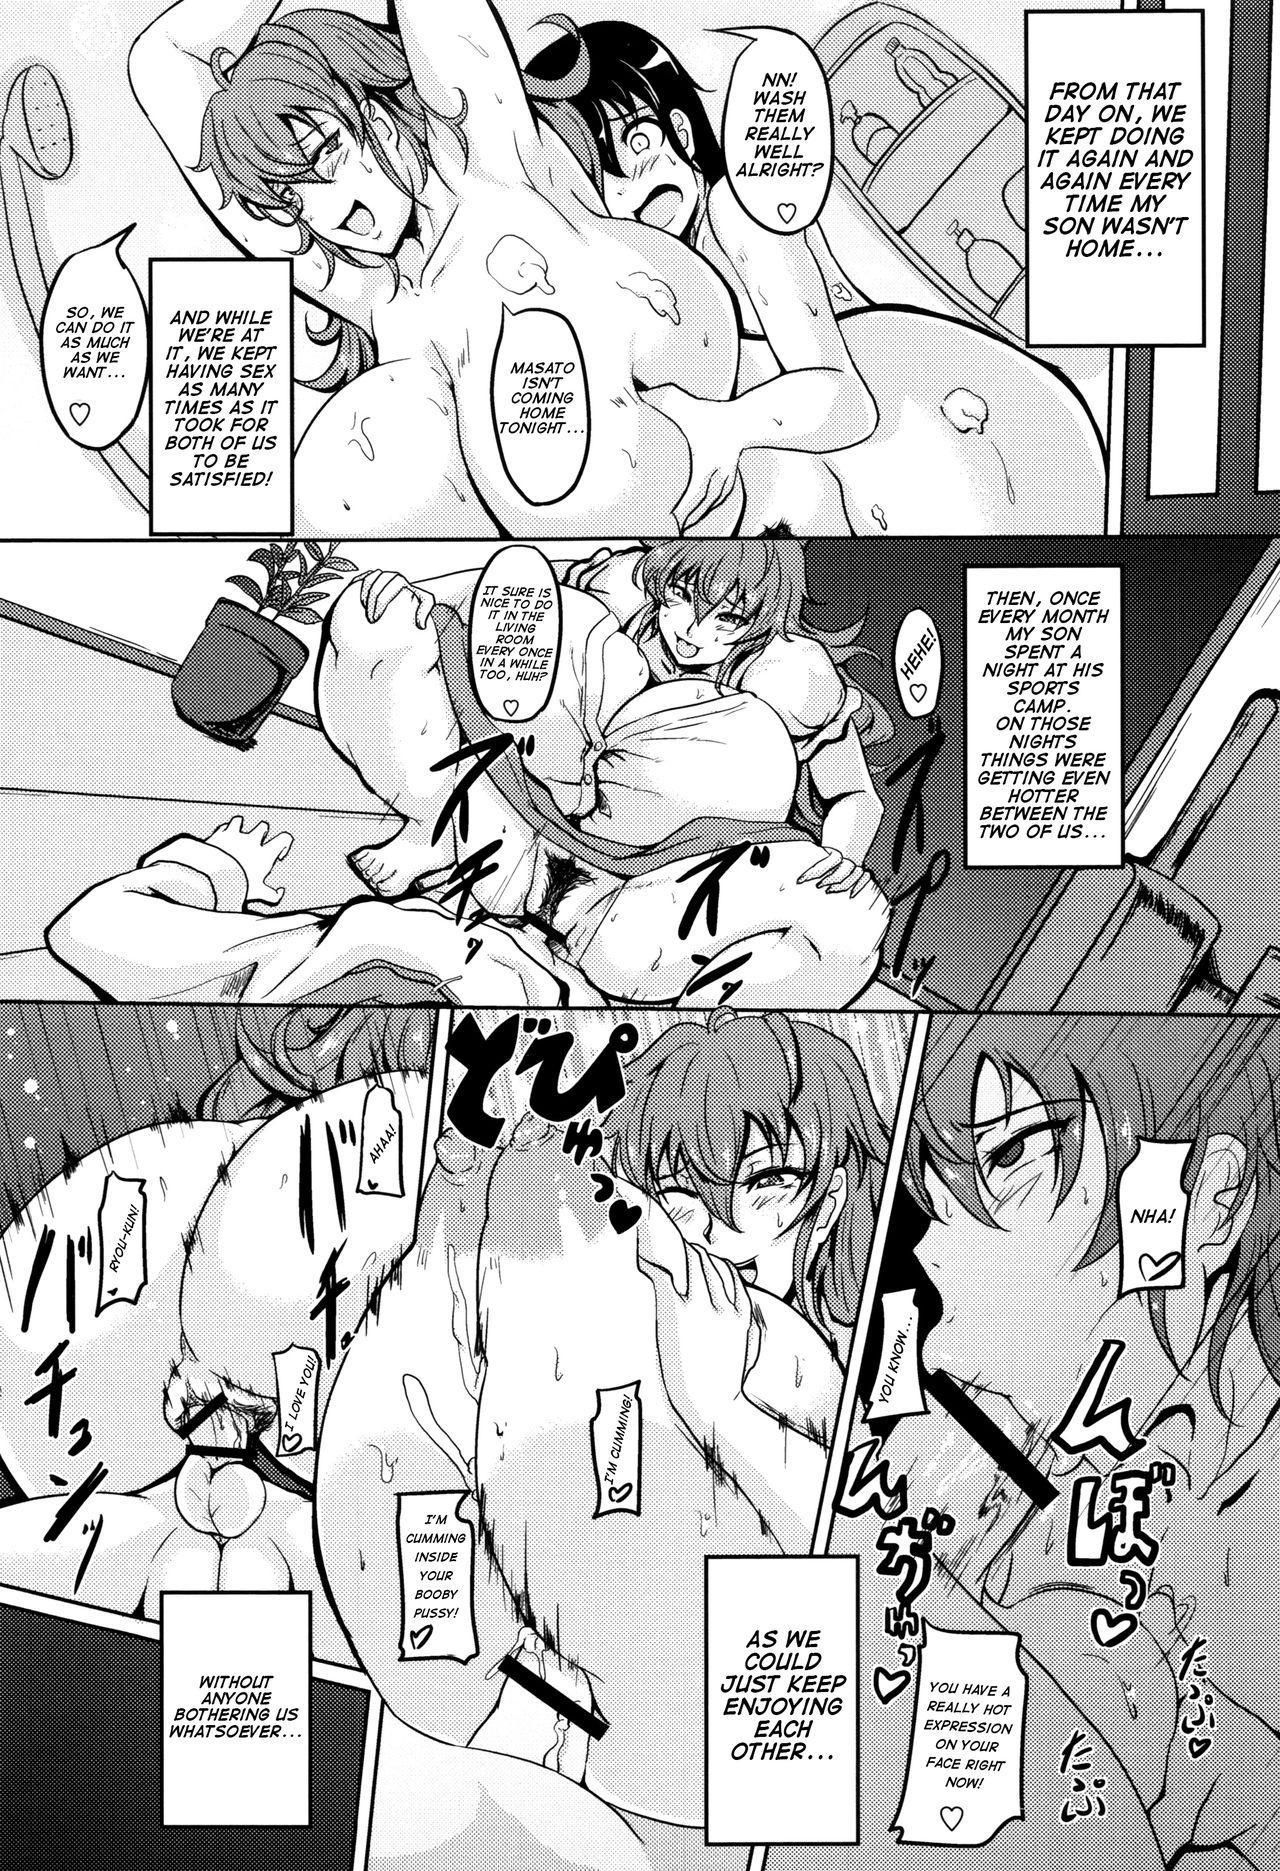 Ikenai Tomohaha | Dirty Mother of a Friend 18